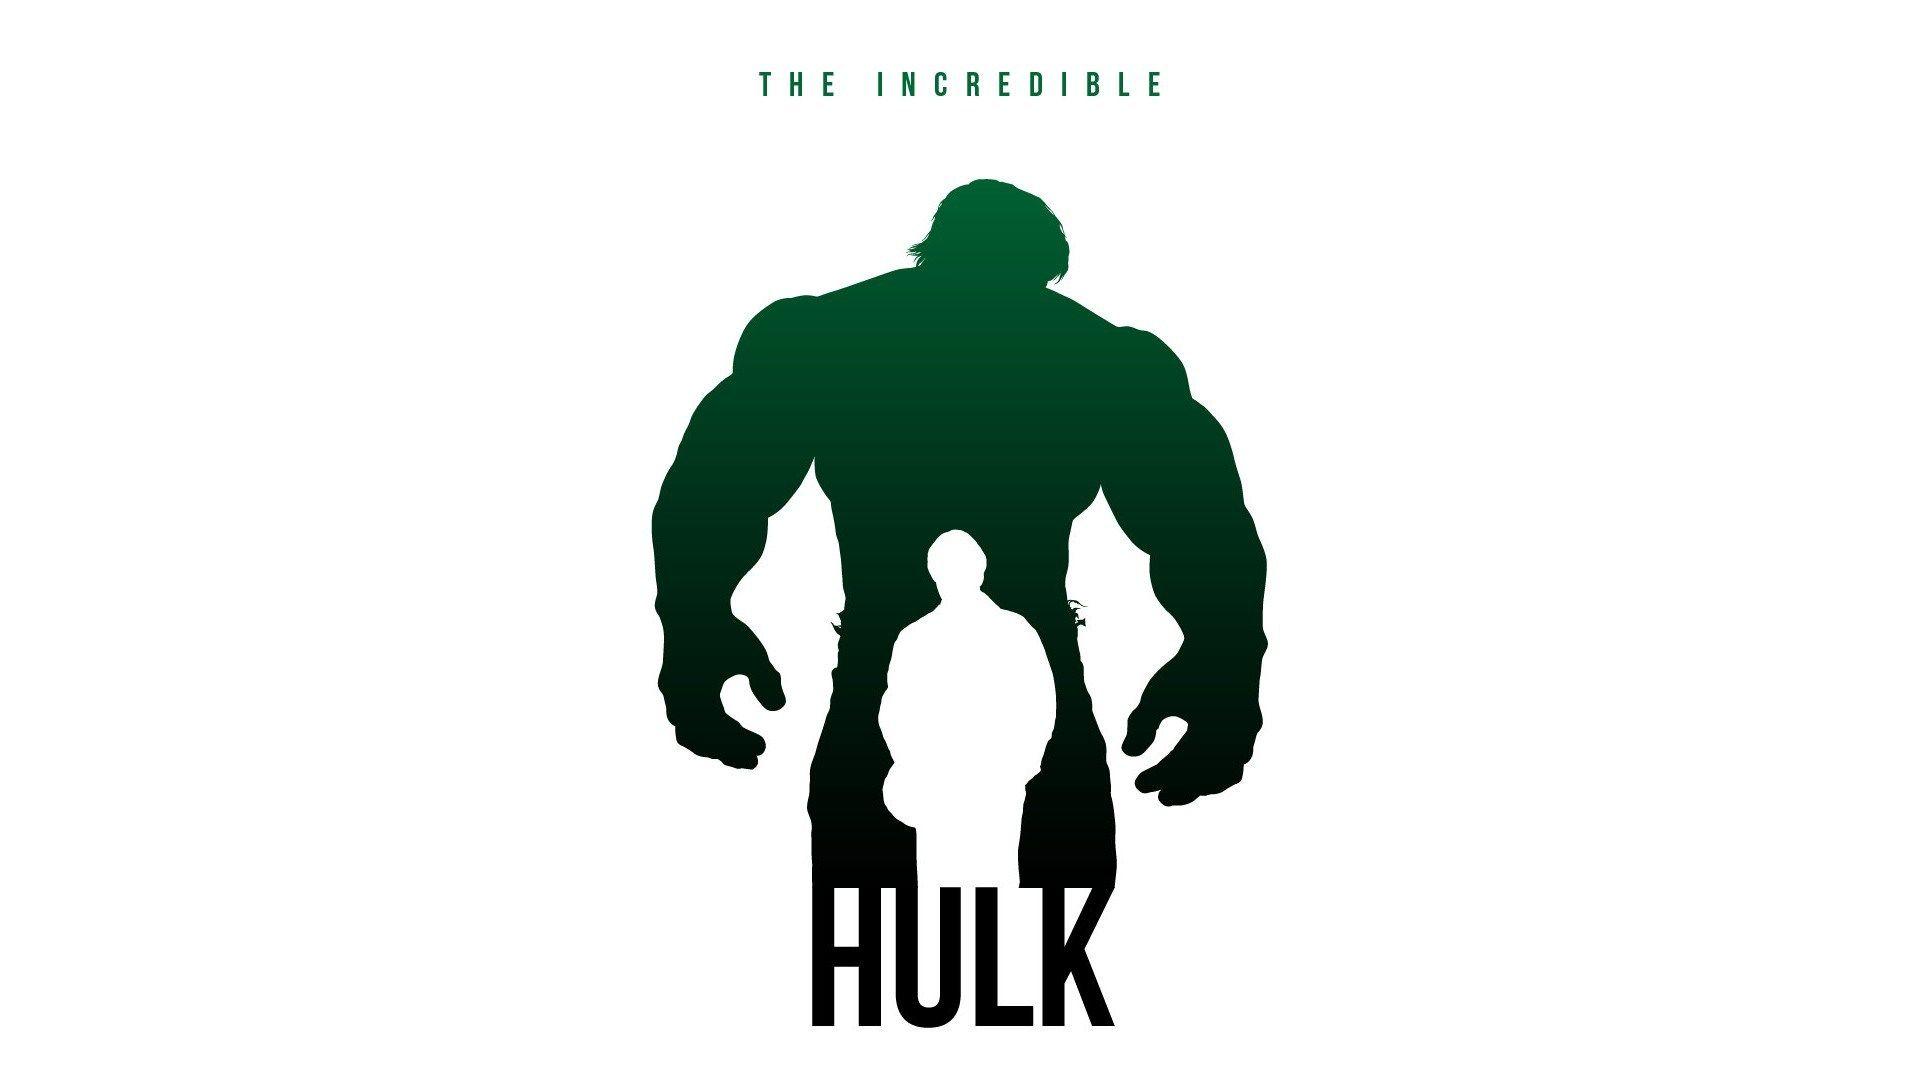 Wallpapers For Incredible Hulk Iphone Wallpaper 1920x1080